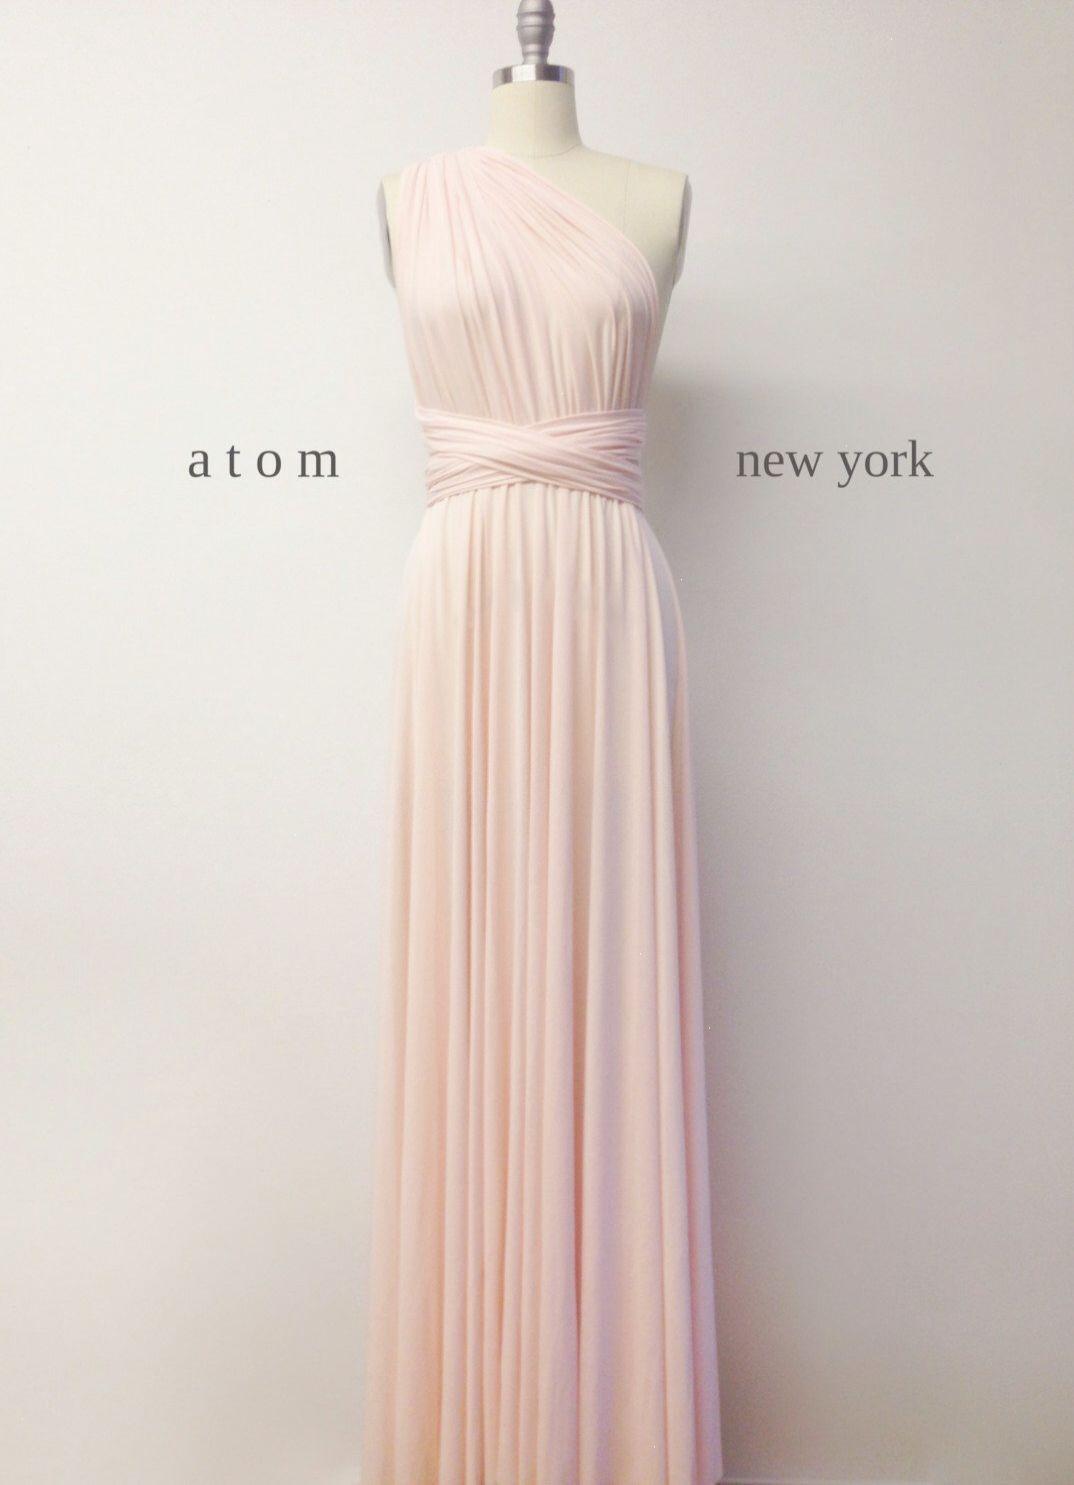 blush pink floor length ball gown long maxi infinity dress